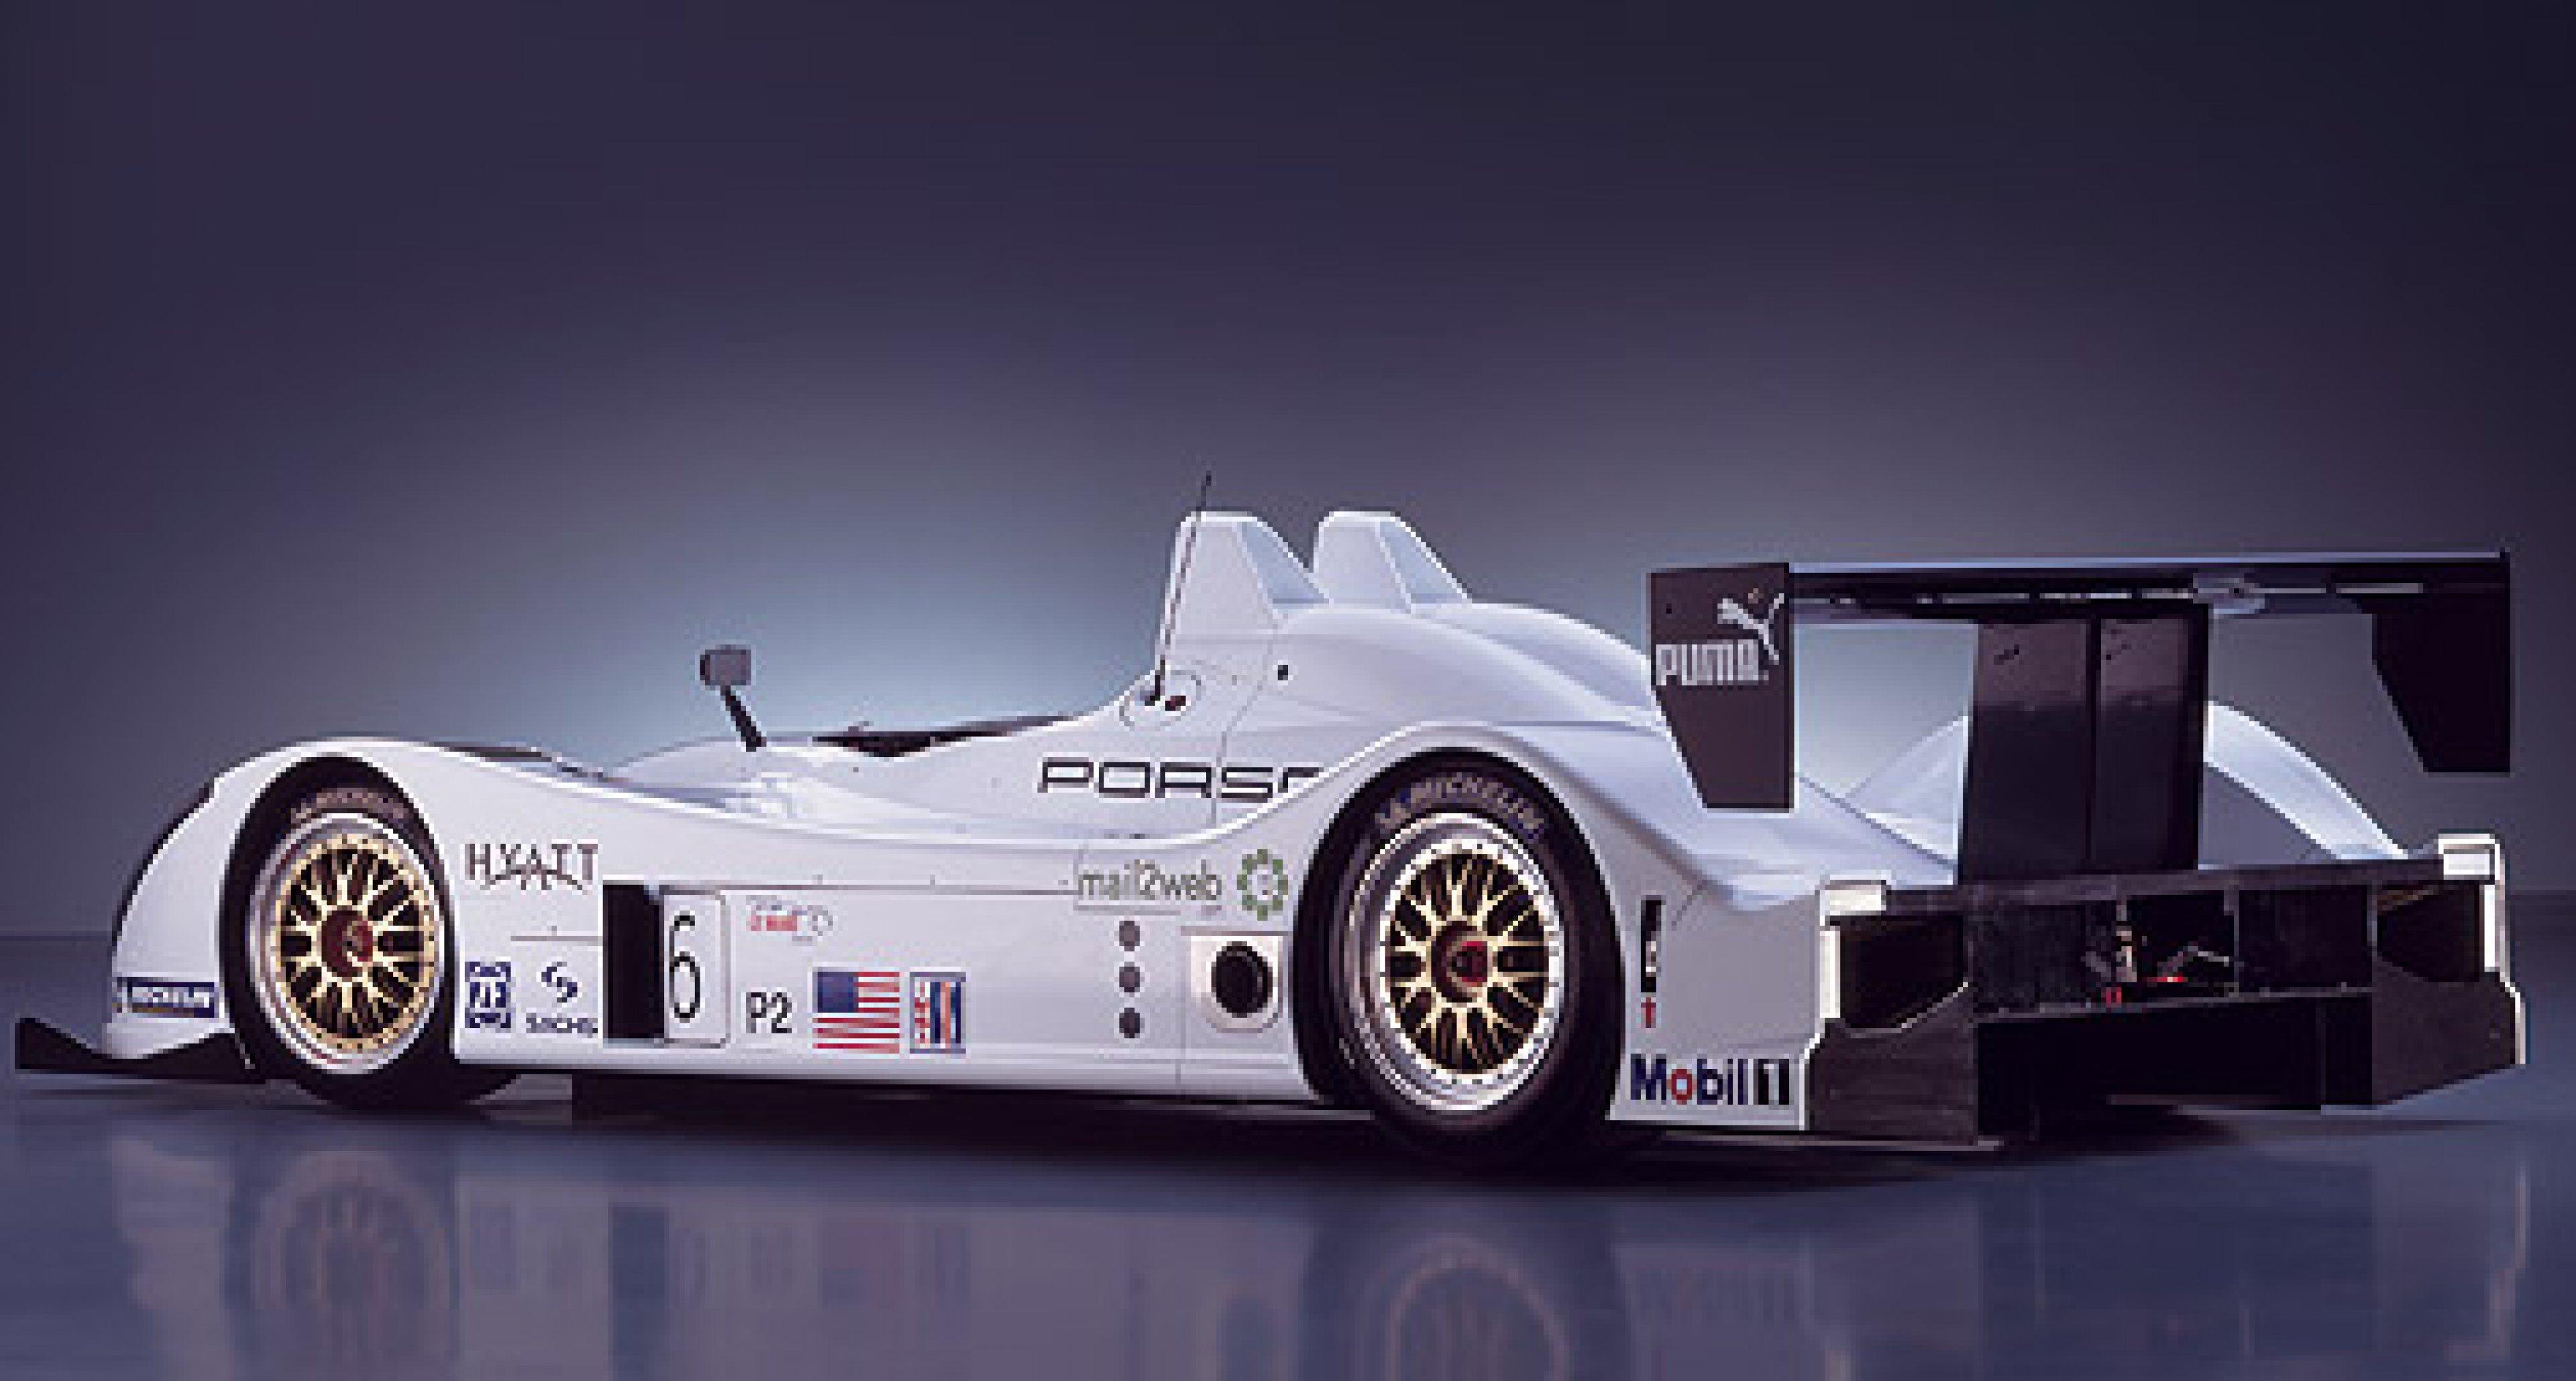 New Porsche Racing Prototype Hits the Track